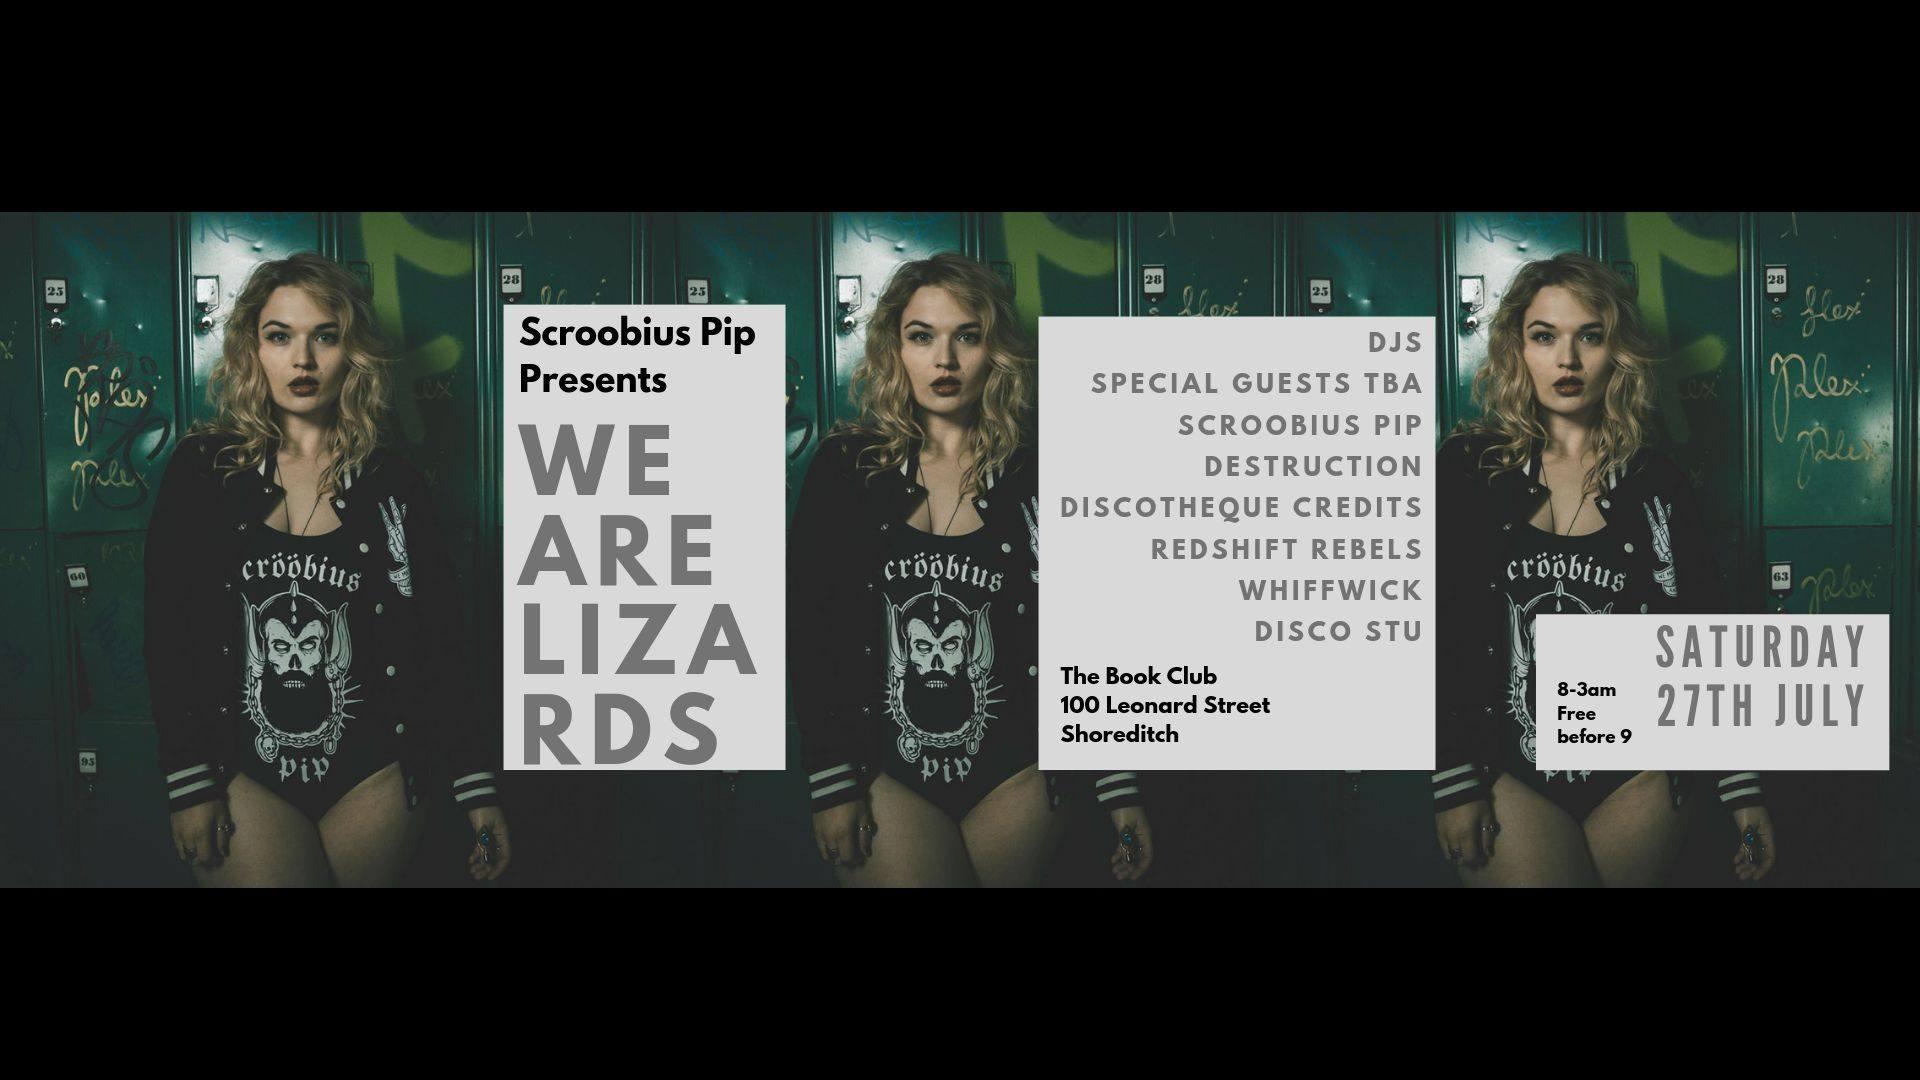 Scroobius Pip Presents We Are Lizards